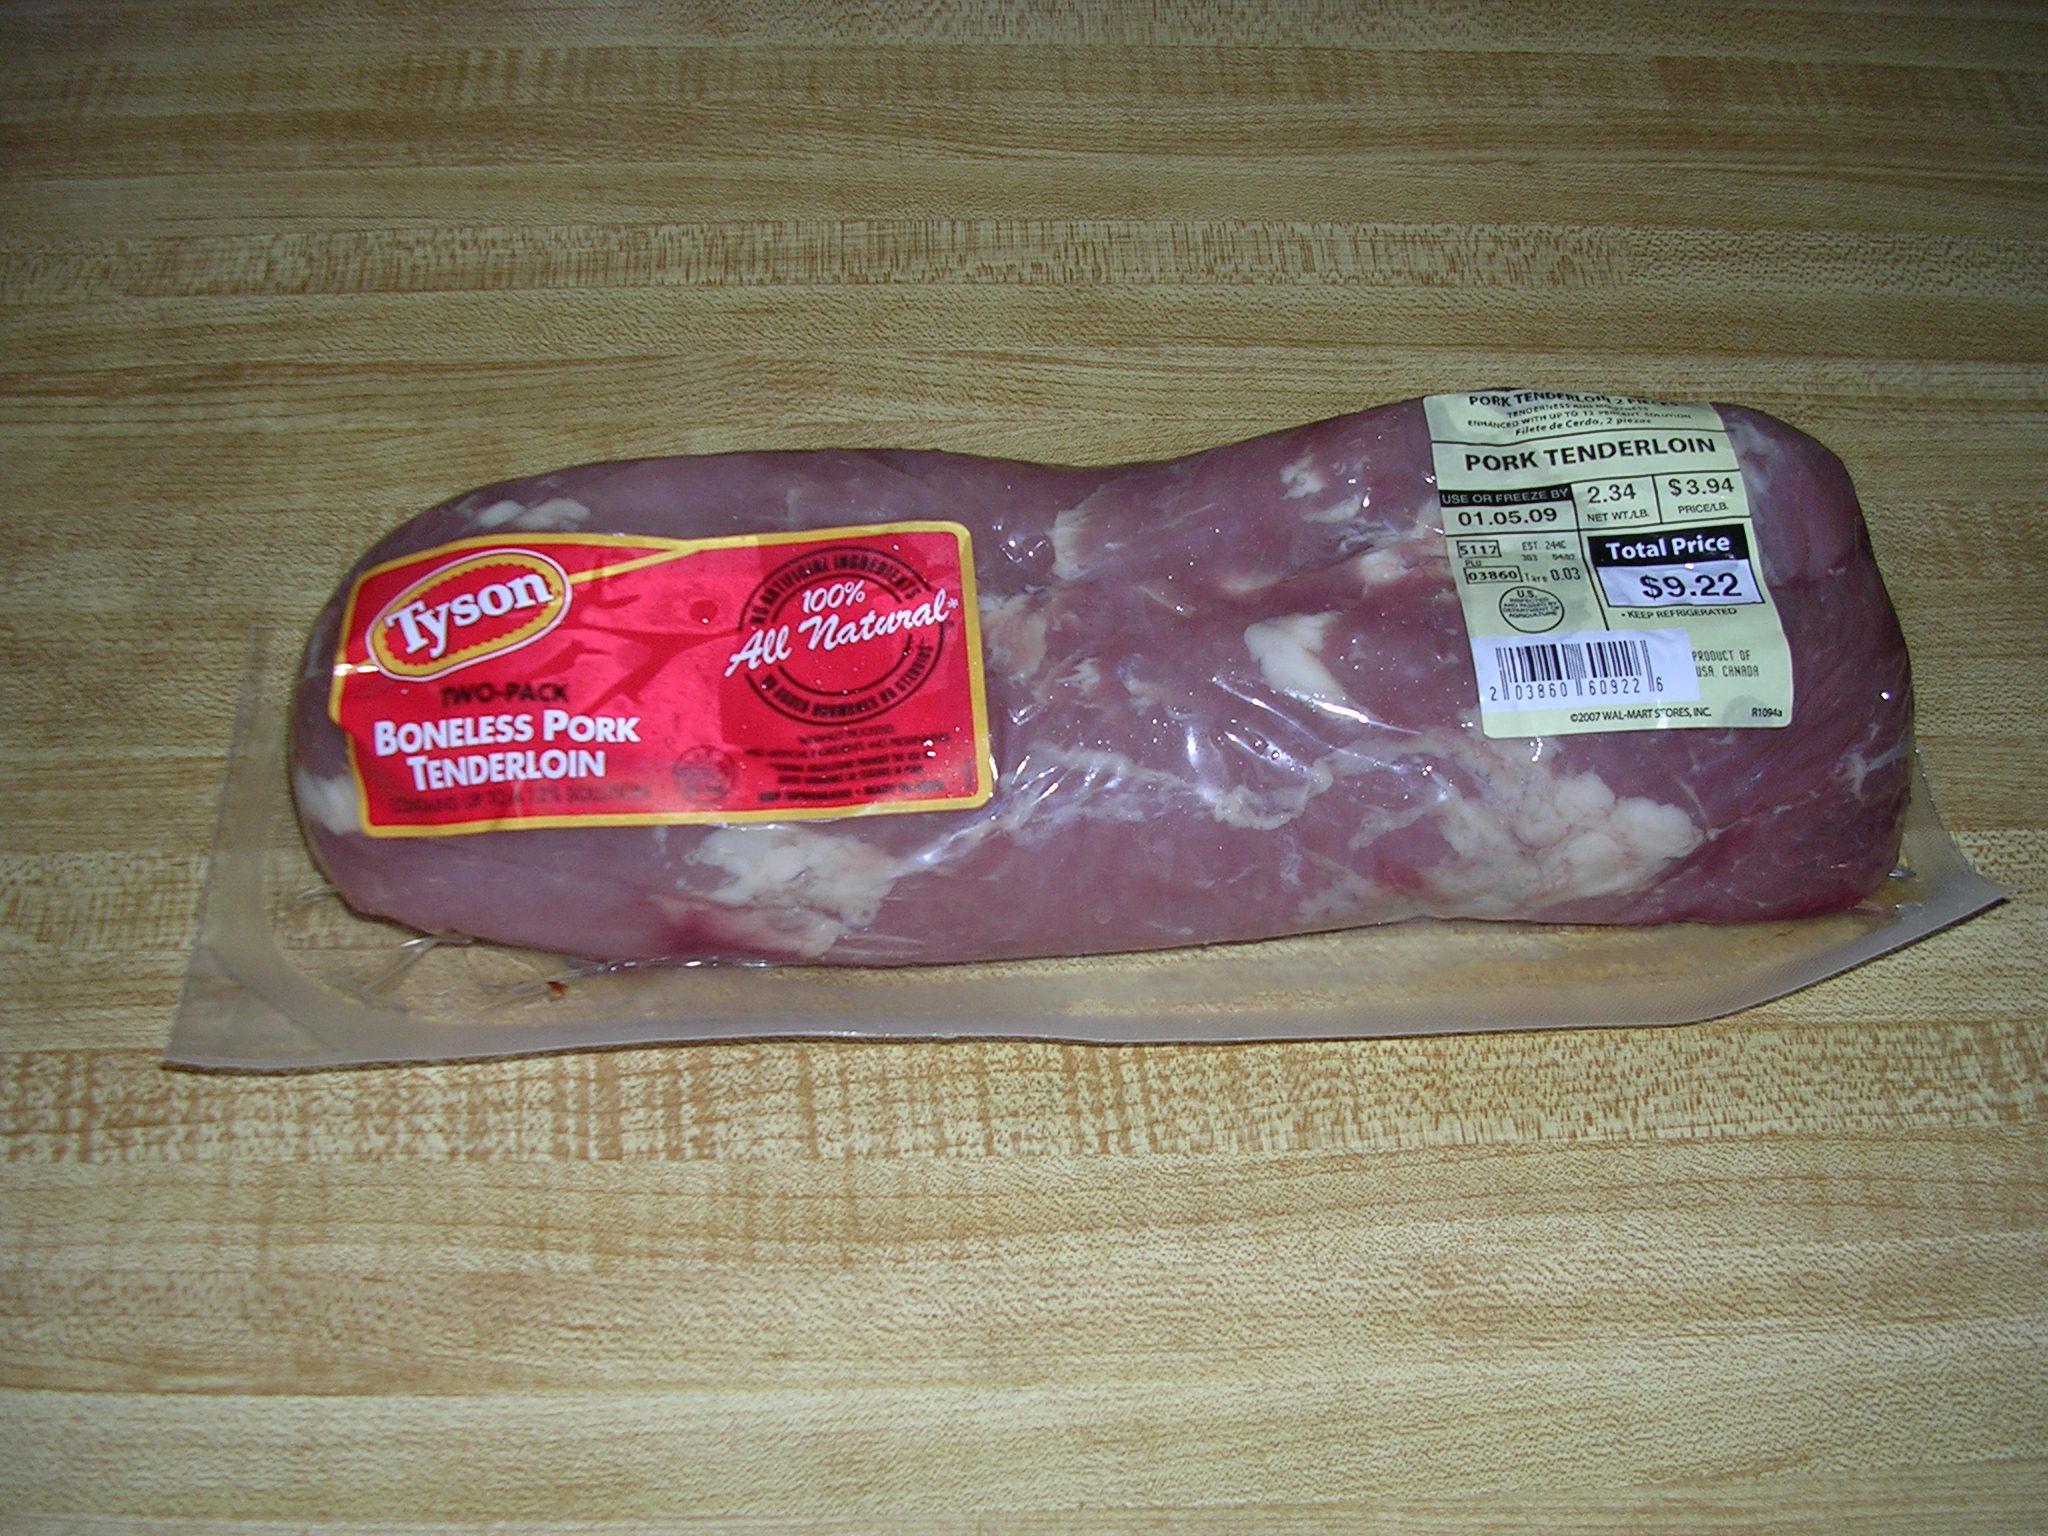 Grilled pork tenderloin swirl